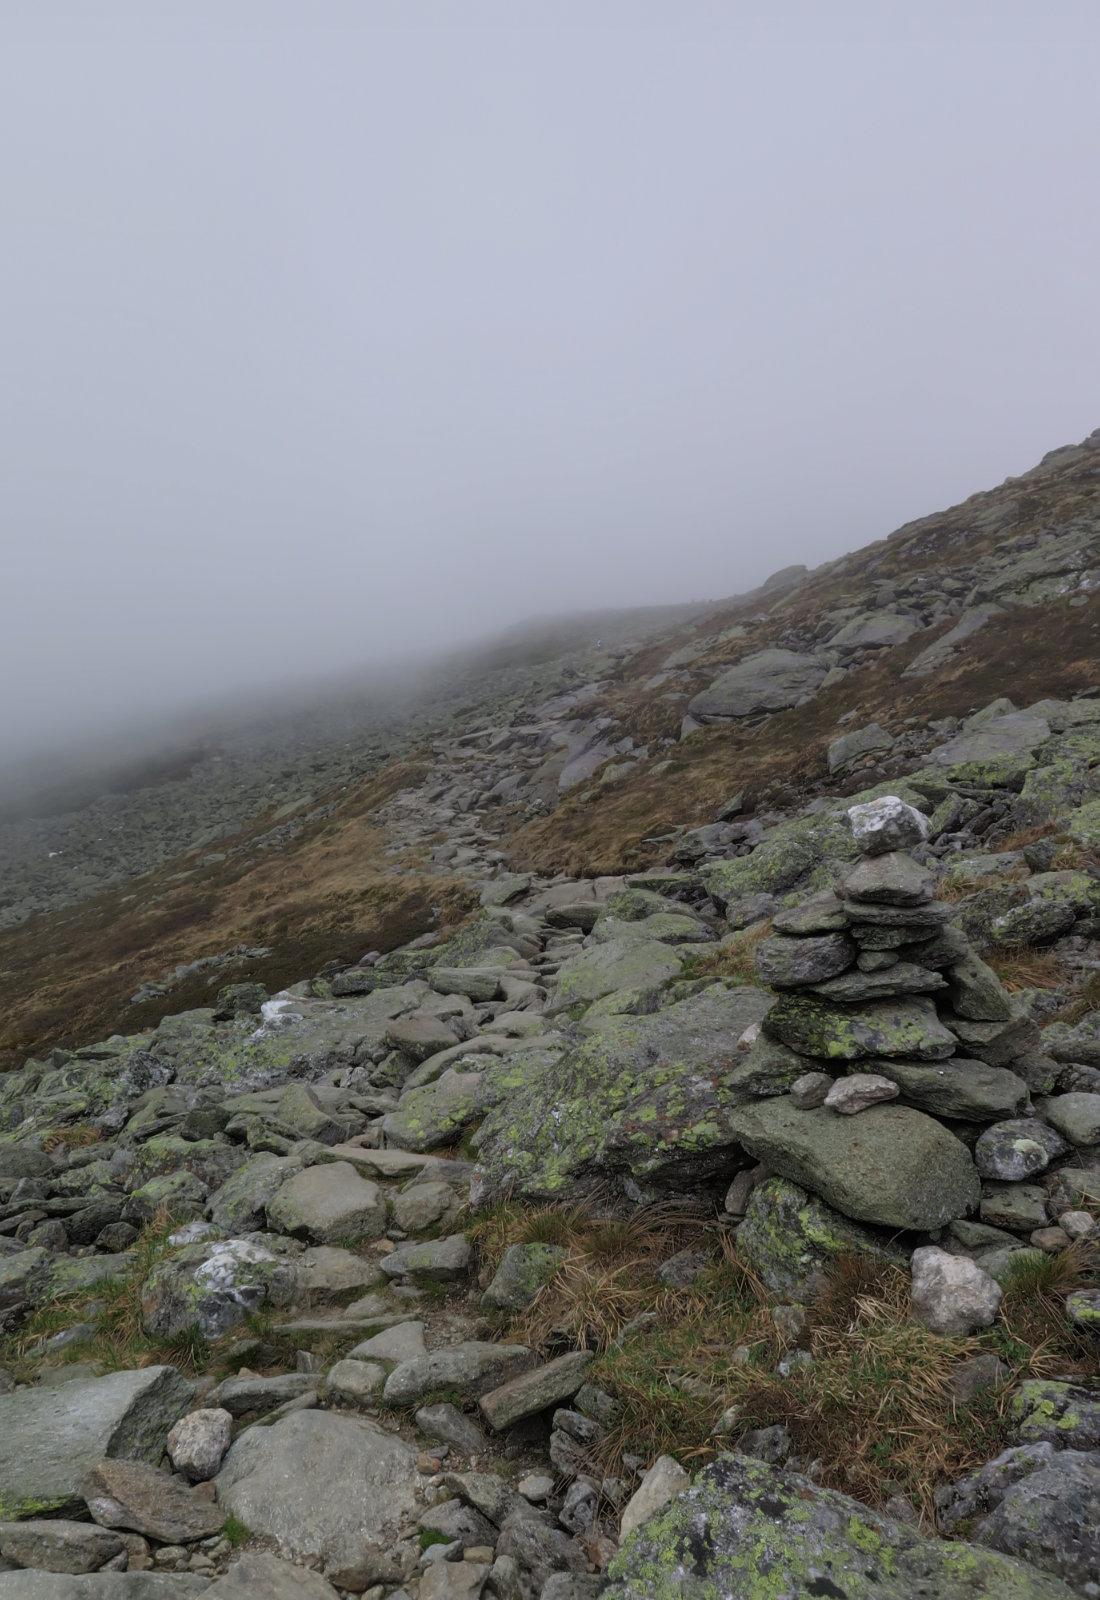 20180602-Washington-cloudy-cairn